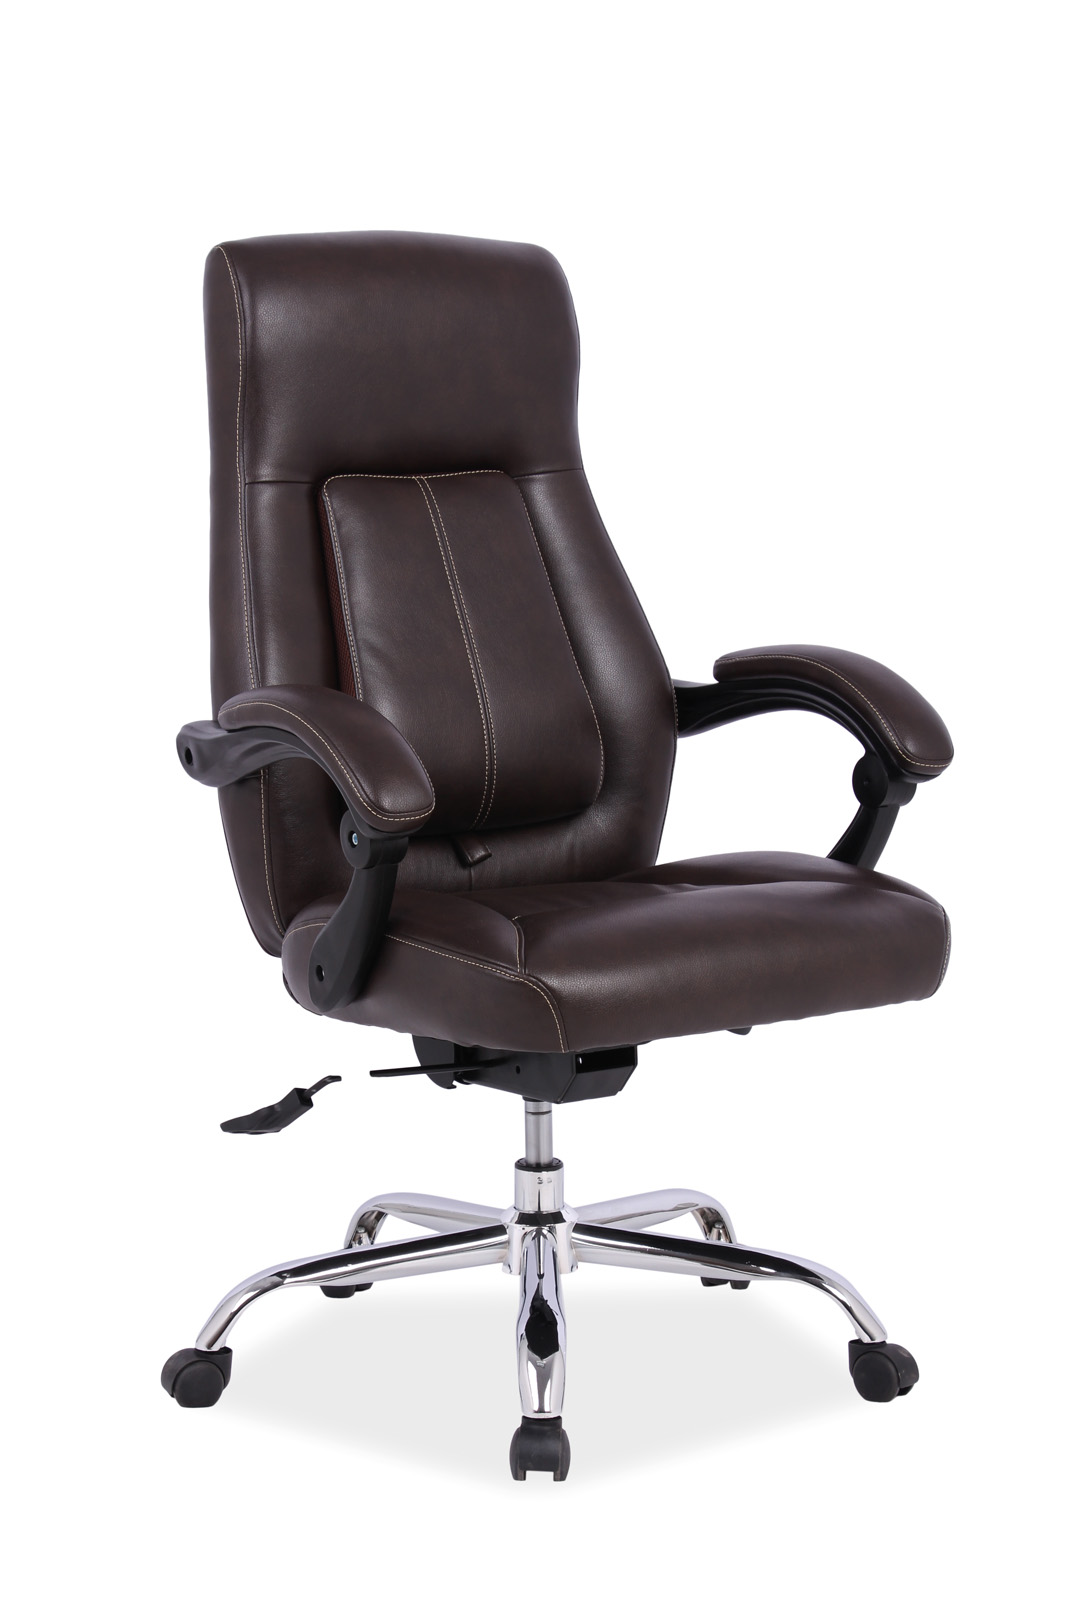 Scaun Birou Directorial Boss Brown - 5020